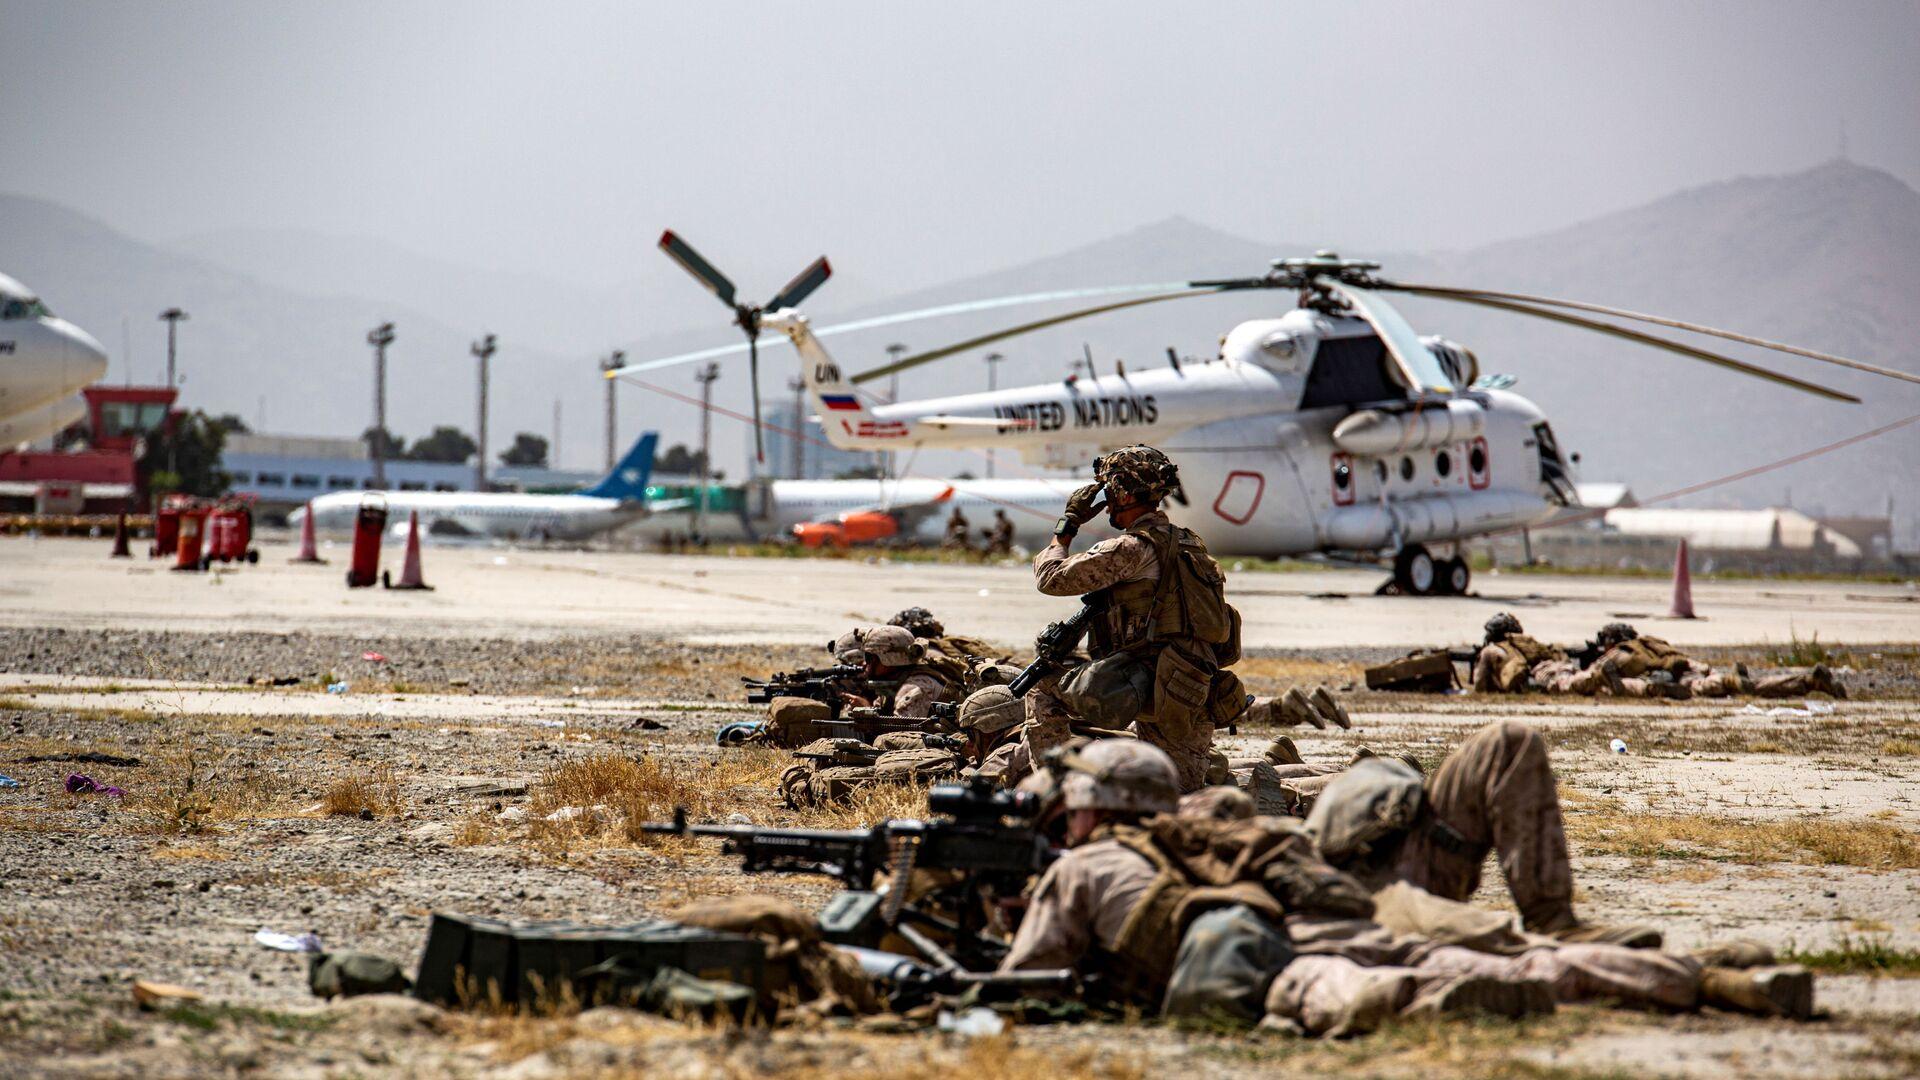 US Marines keep watch during an evacuation at Hamid Karzai International Airport, Kabul, Afghanistan, 18 August 2021 - Sputnik International, 1920, 06.09.2021